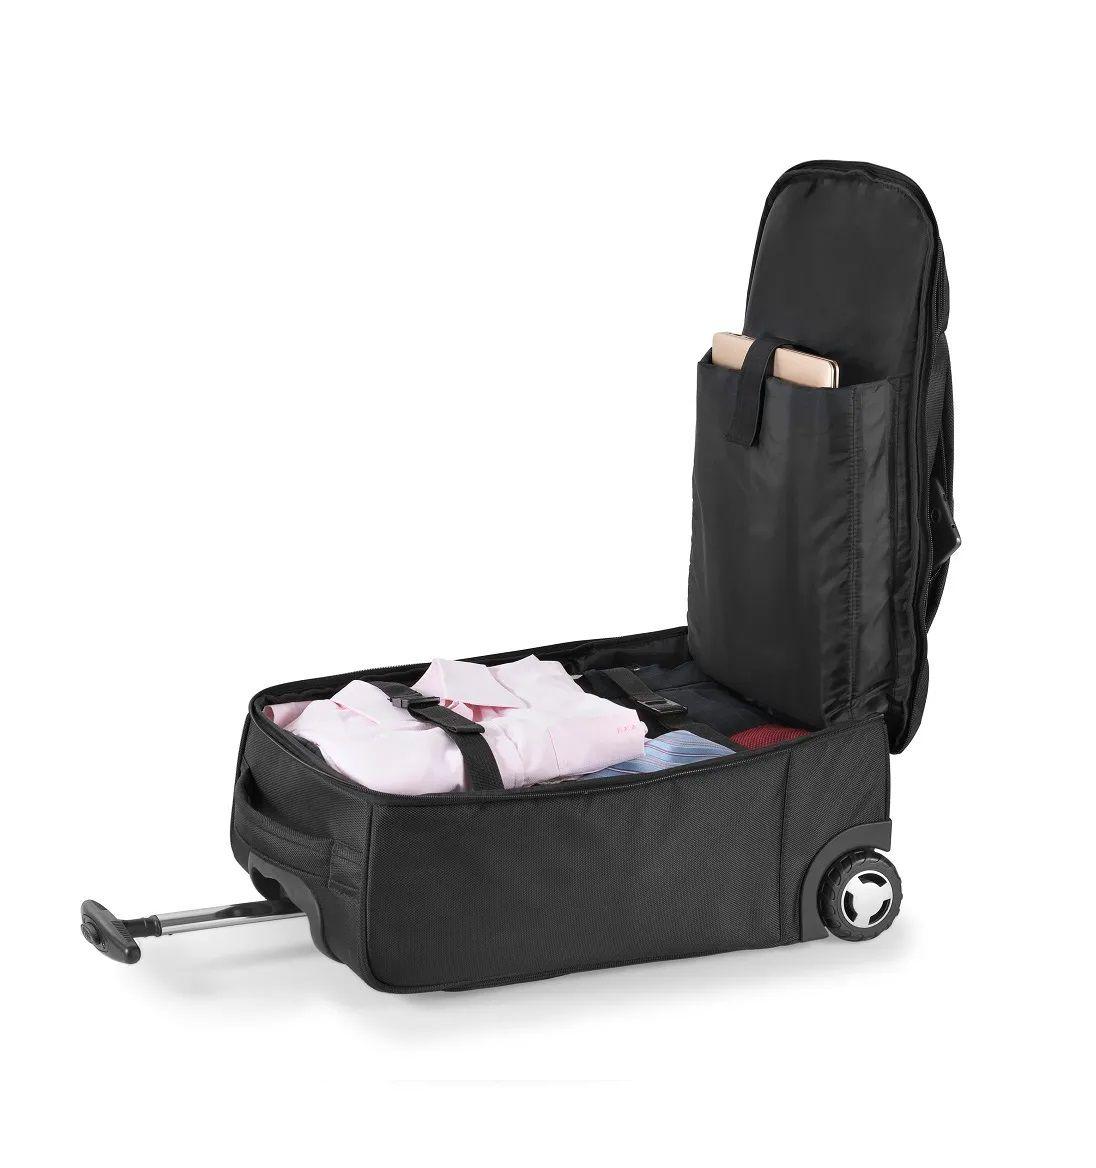 "Mala de Bordo Trolley com 2 Rodas Compartimento Notebook até 19"" Multilaser BO416  - Mix Eletro"